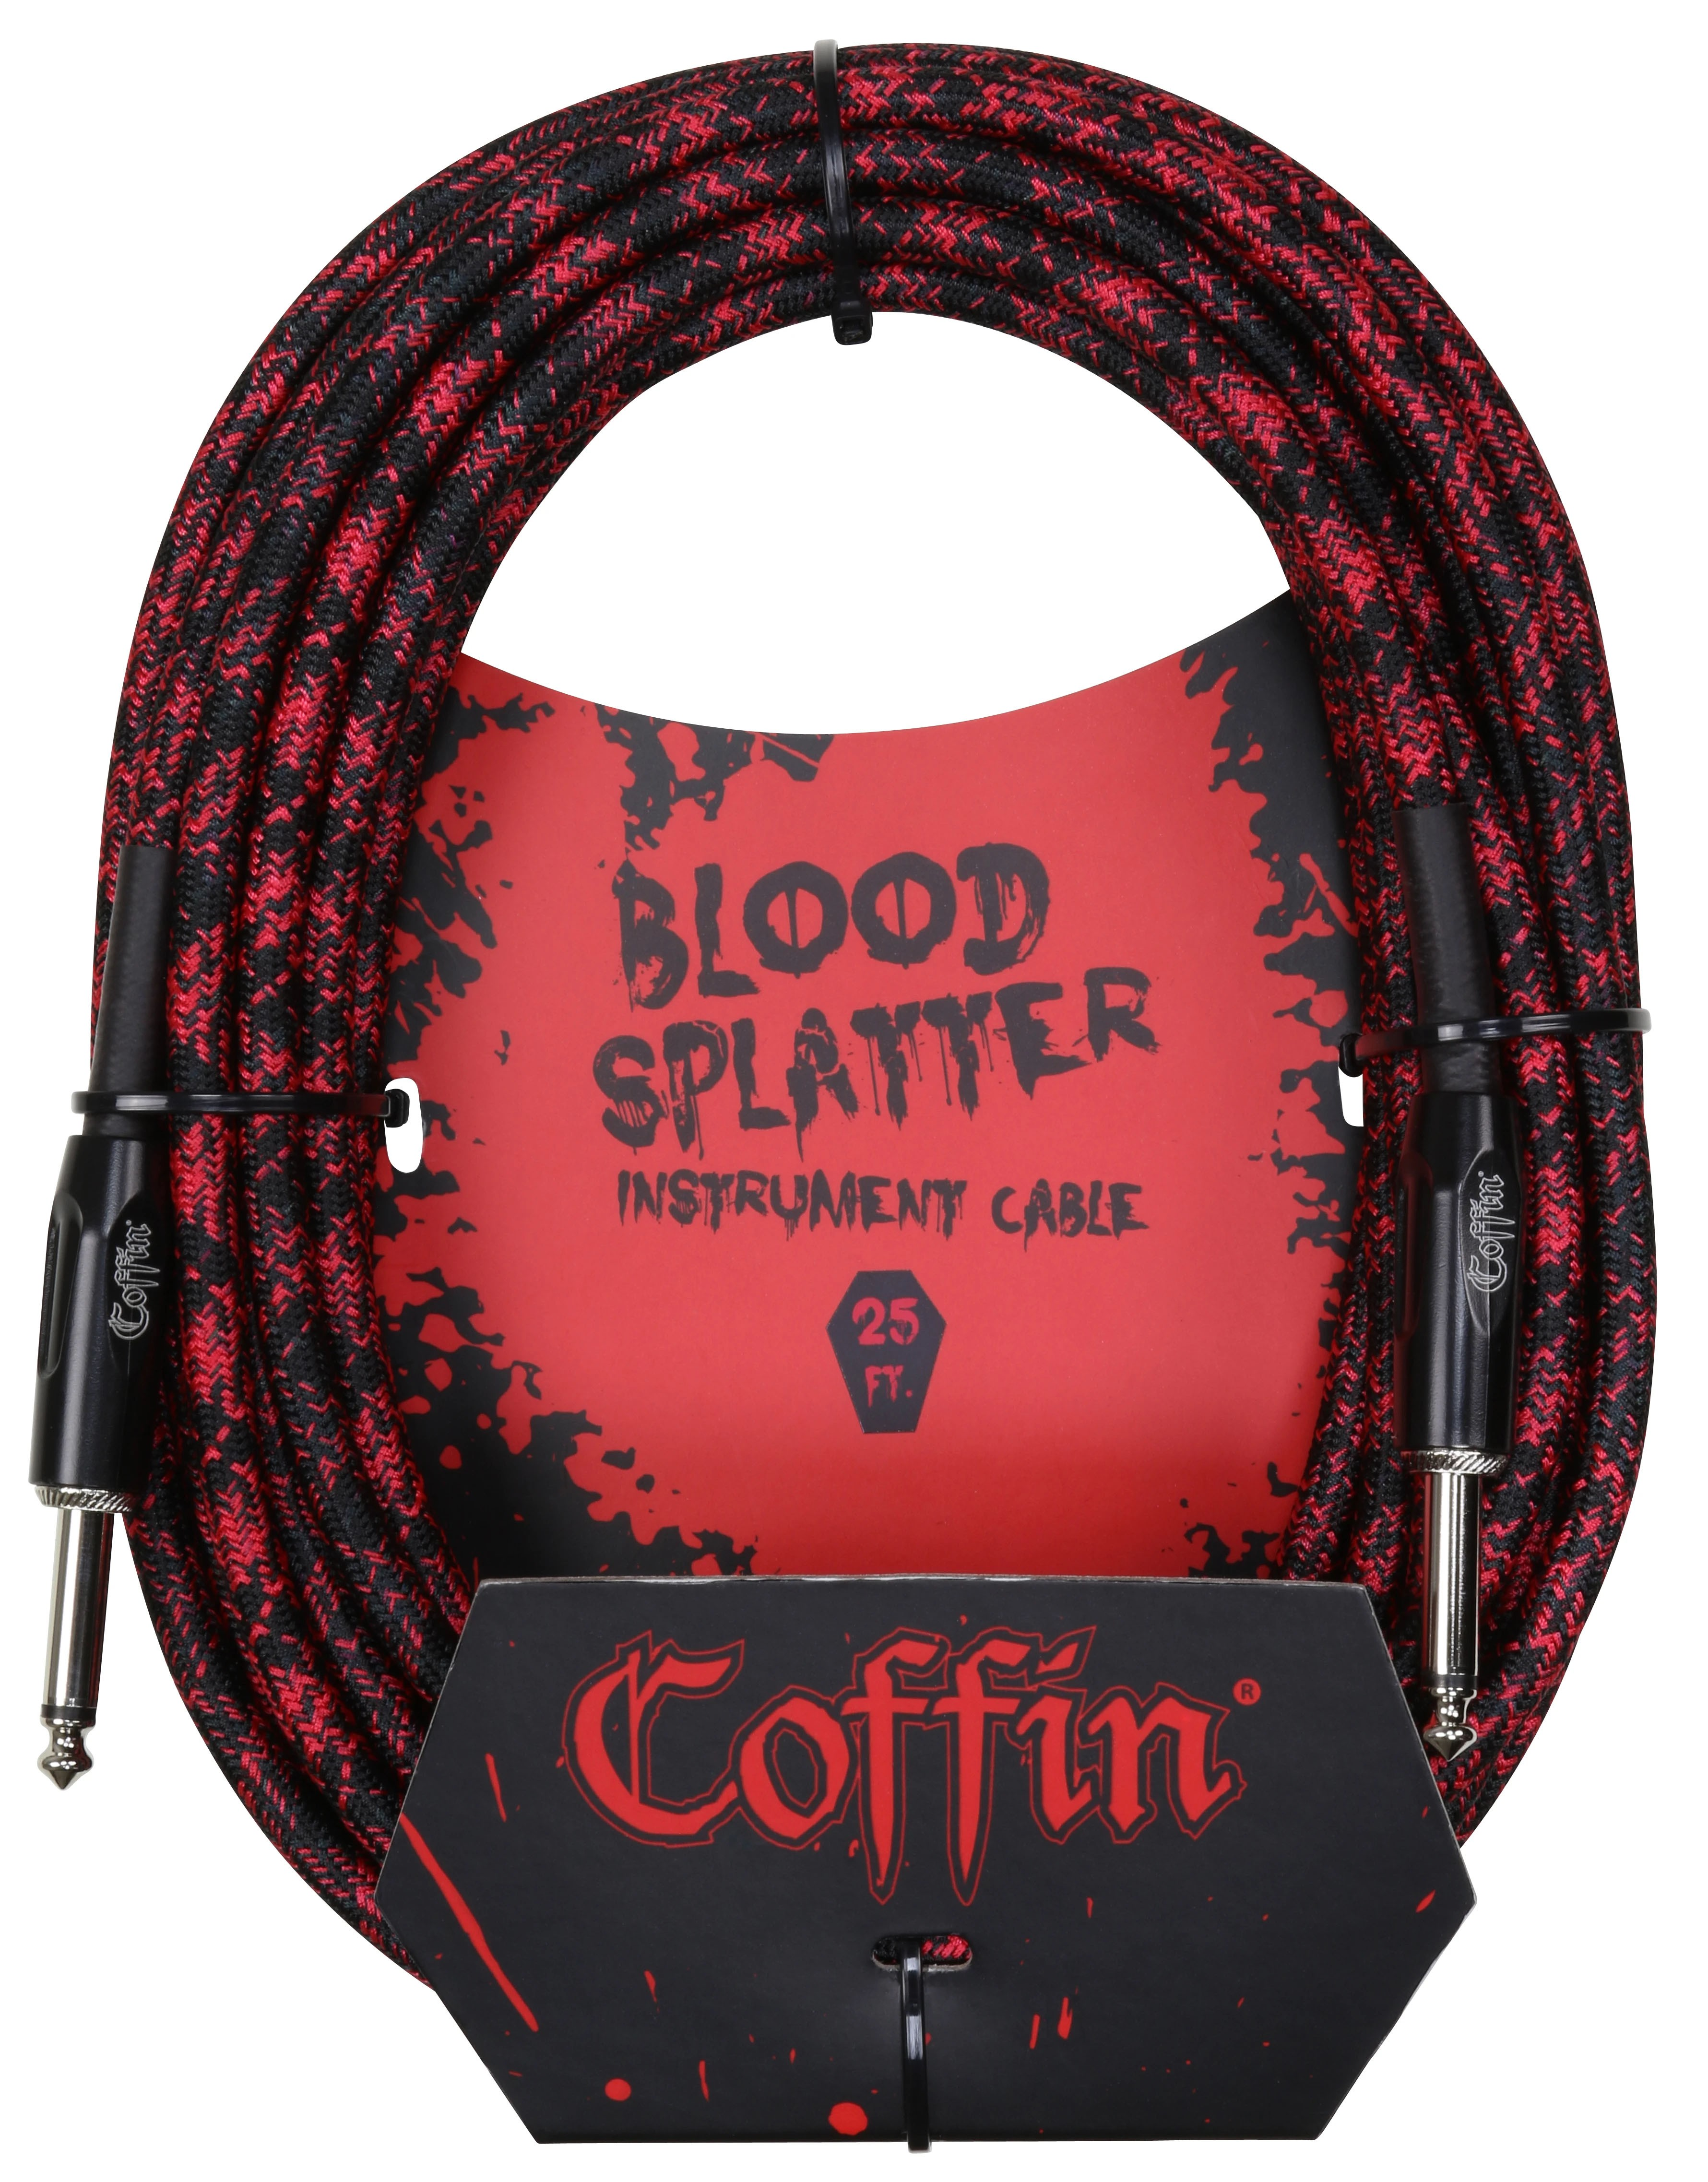 Coffin Case Bloodsplatter Instrument Cable 25ft - Straight